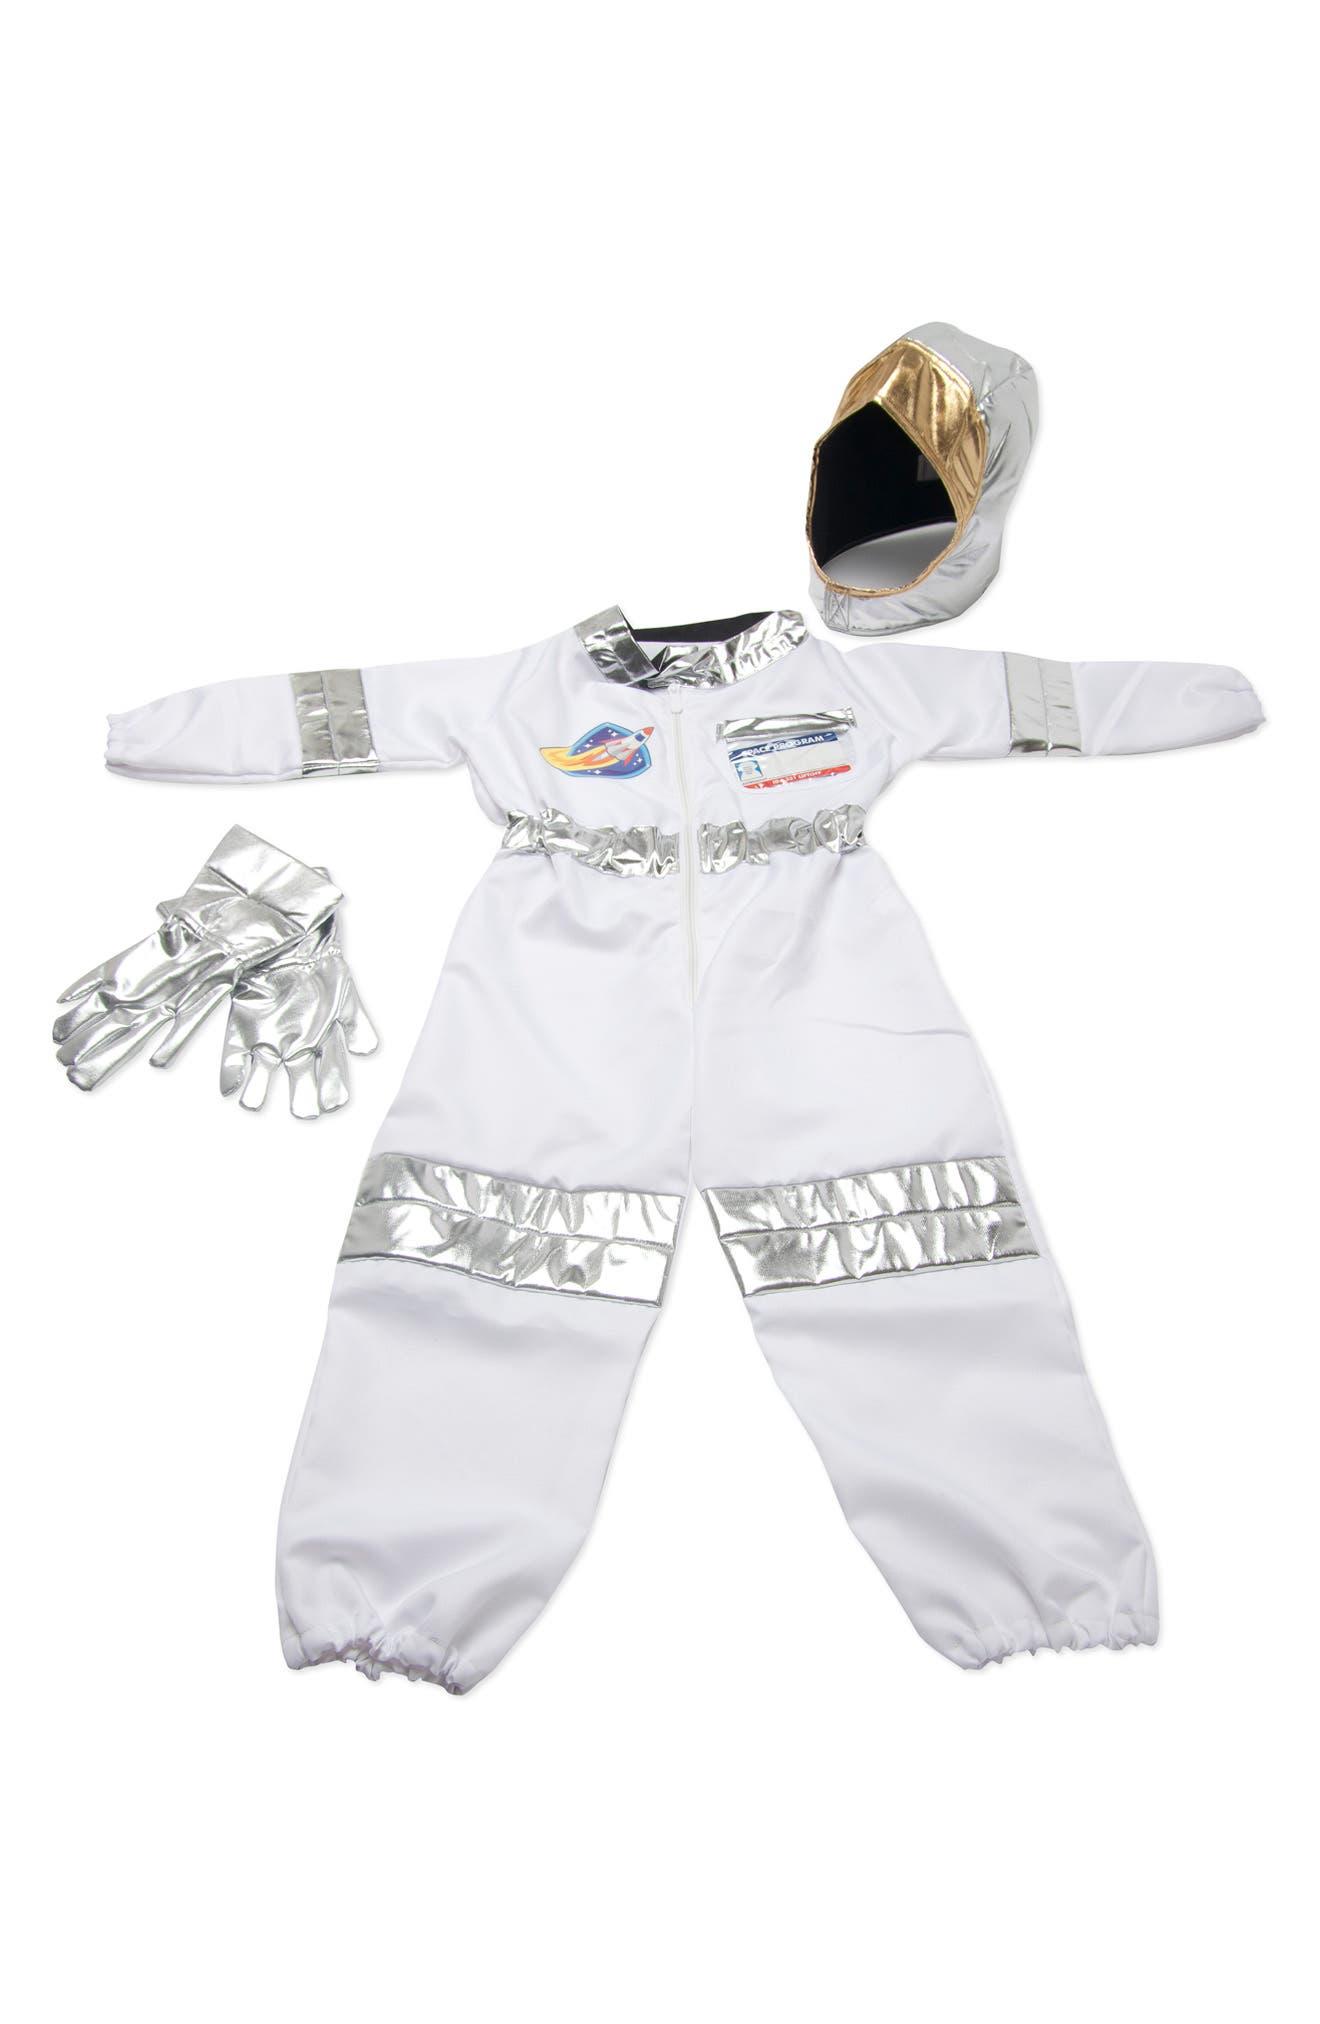 Astronaut Role Play Set,                             Main thumbnail 1, color,                             040